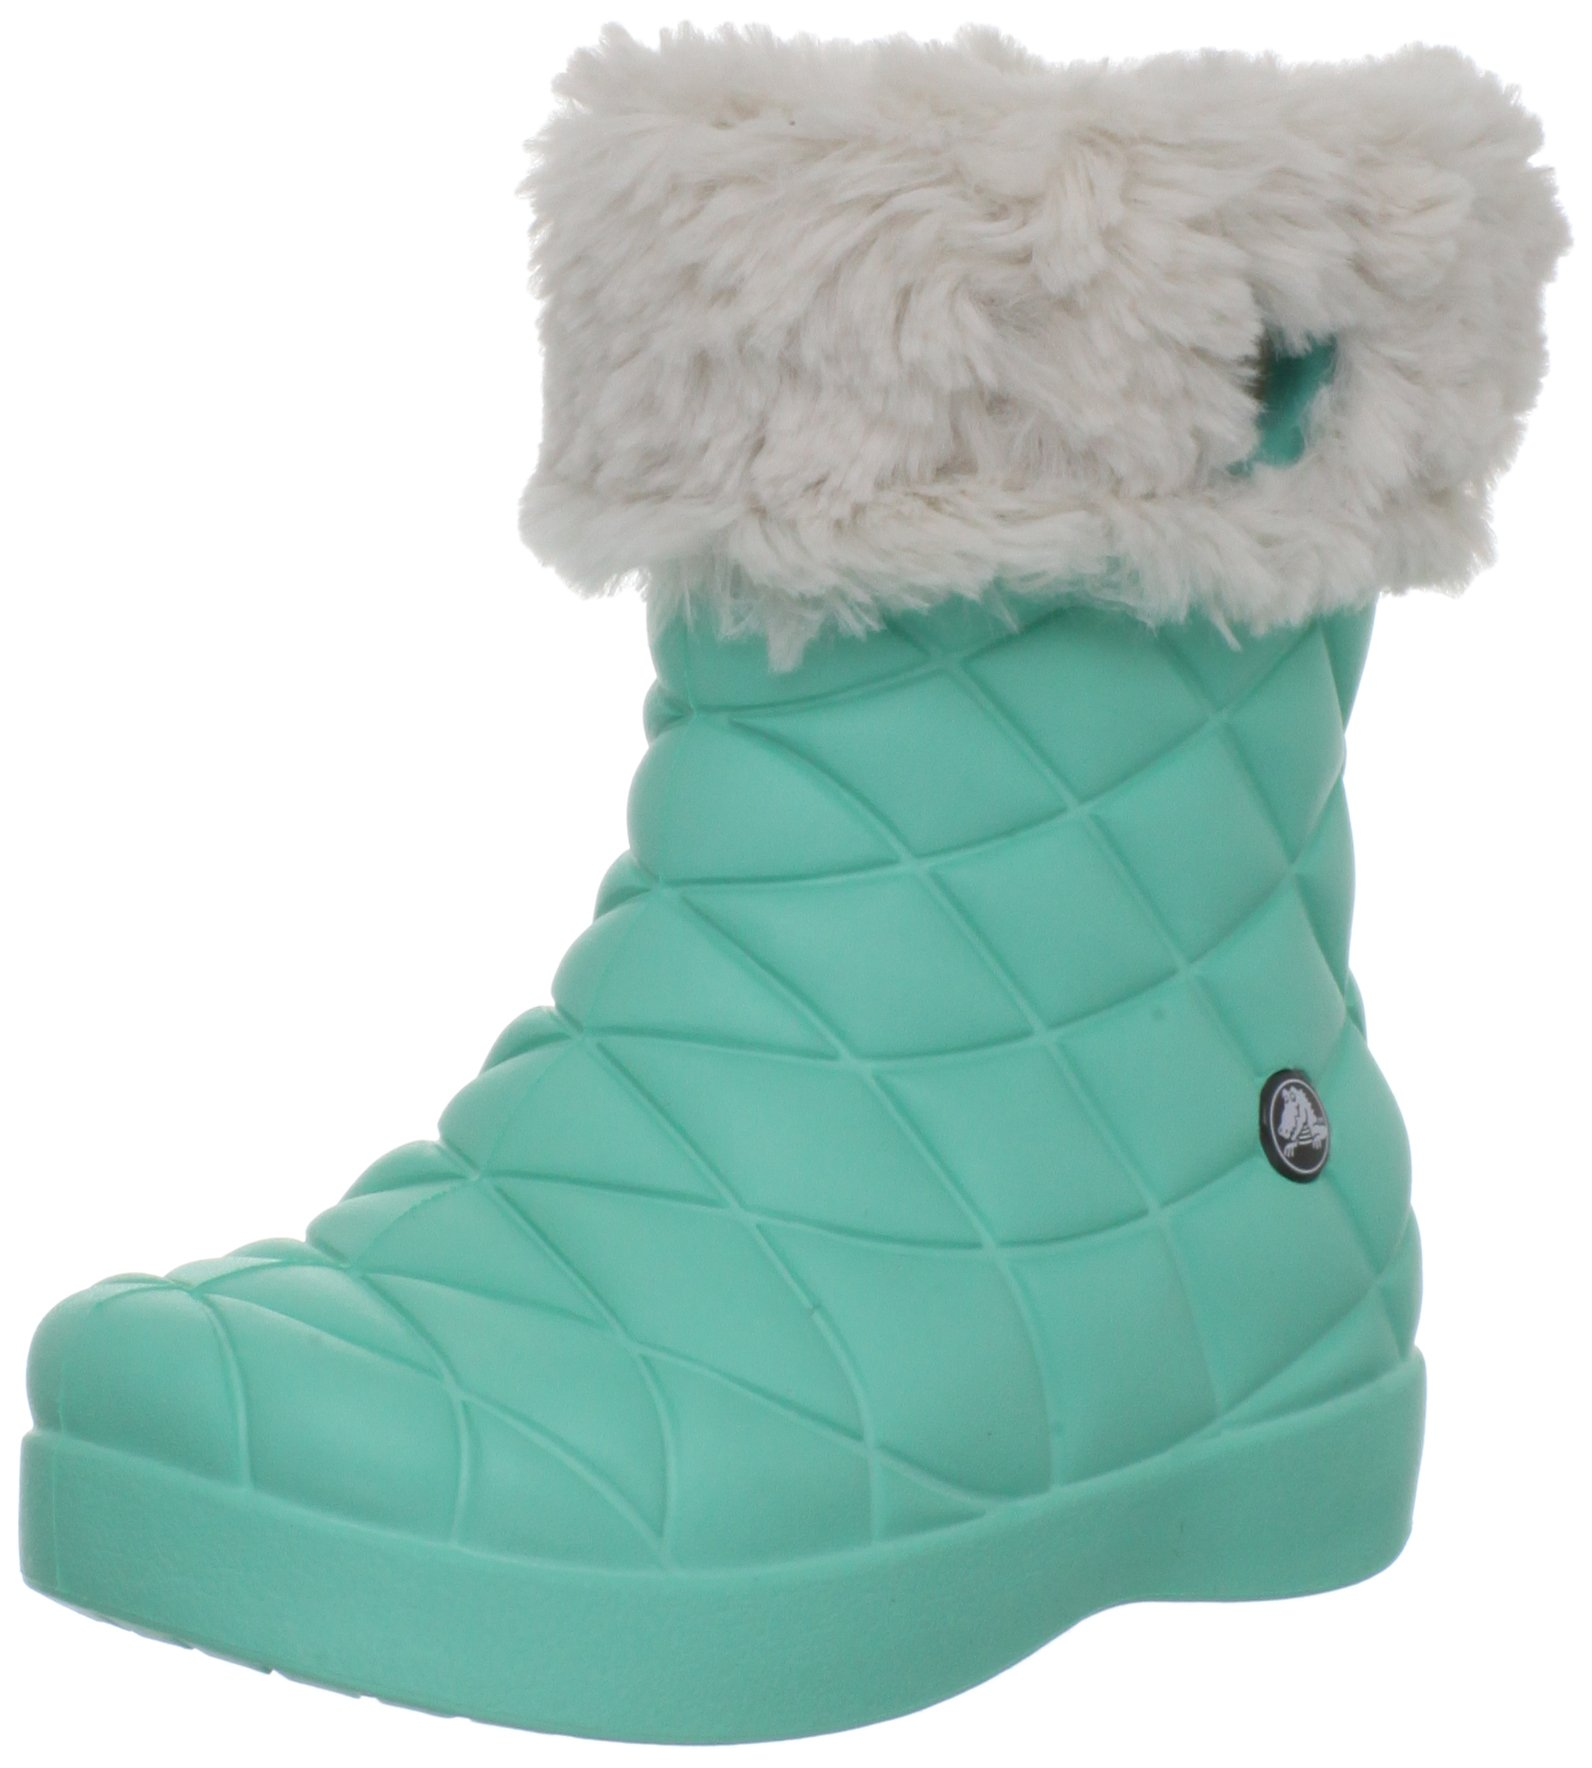 Crocs Super Molded Boot G Boot (Toddler/Little Kid/Big Kid),Island Green/Oyster,8 M US Toddler